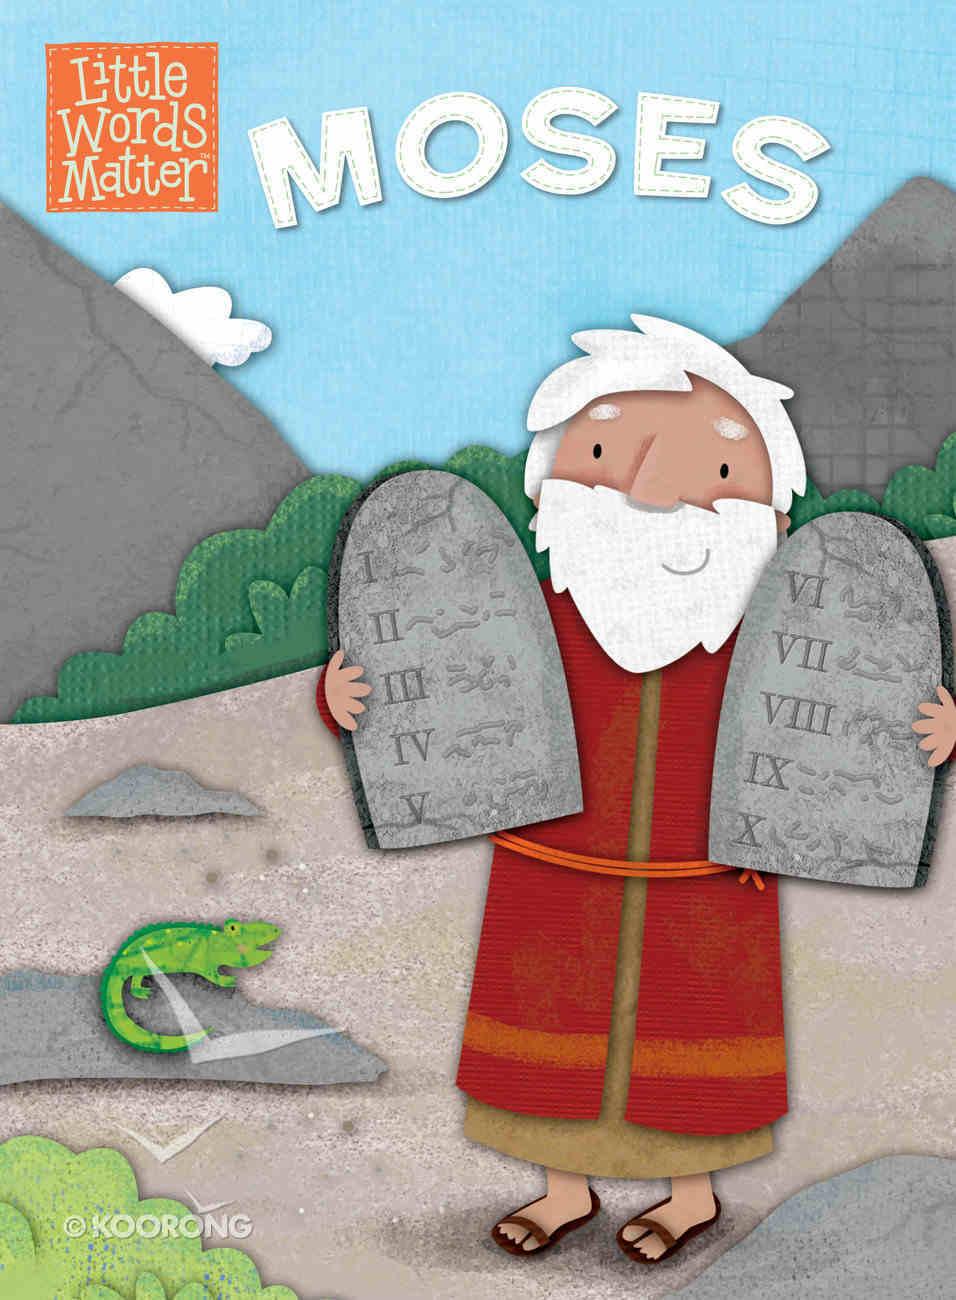 Moses (Little Words Matter Series) Board Book